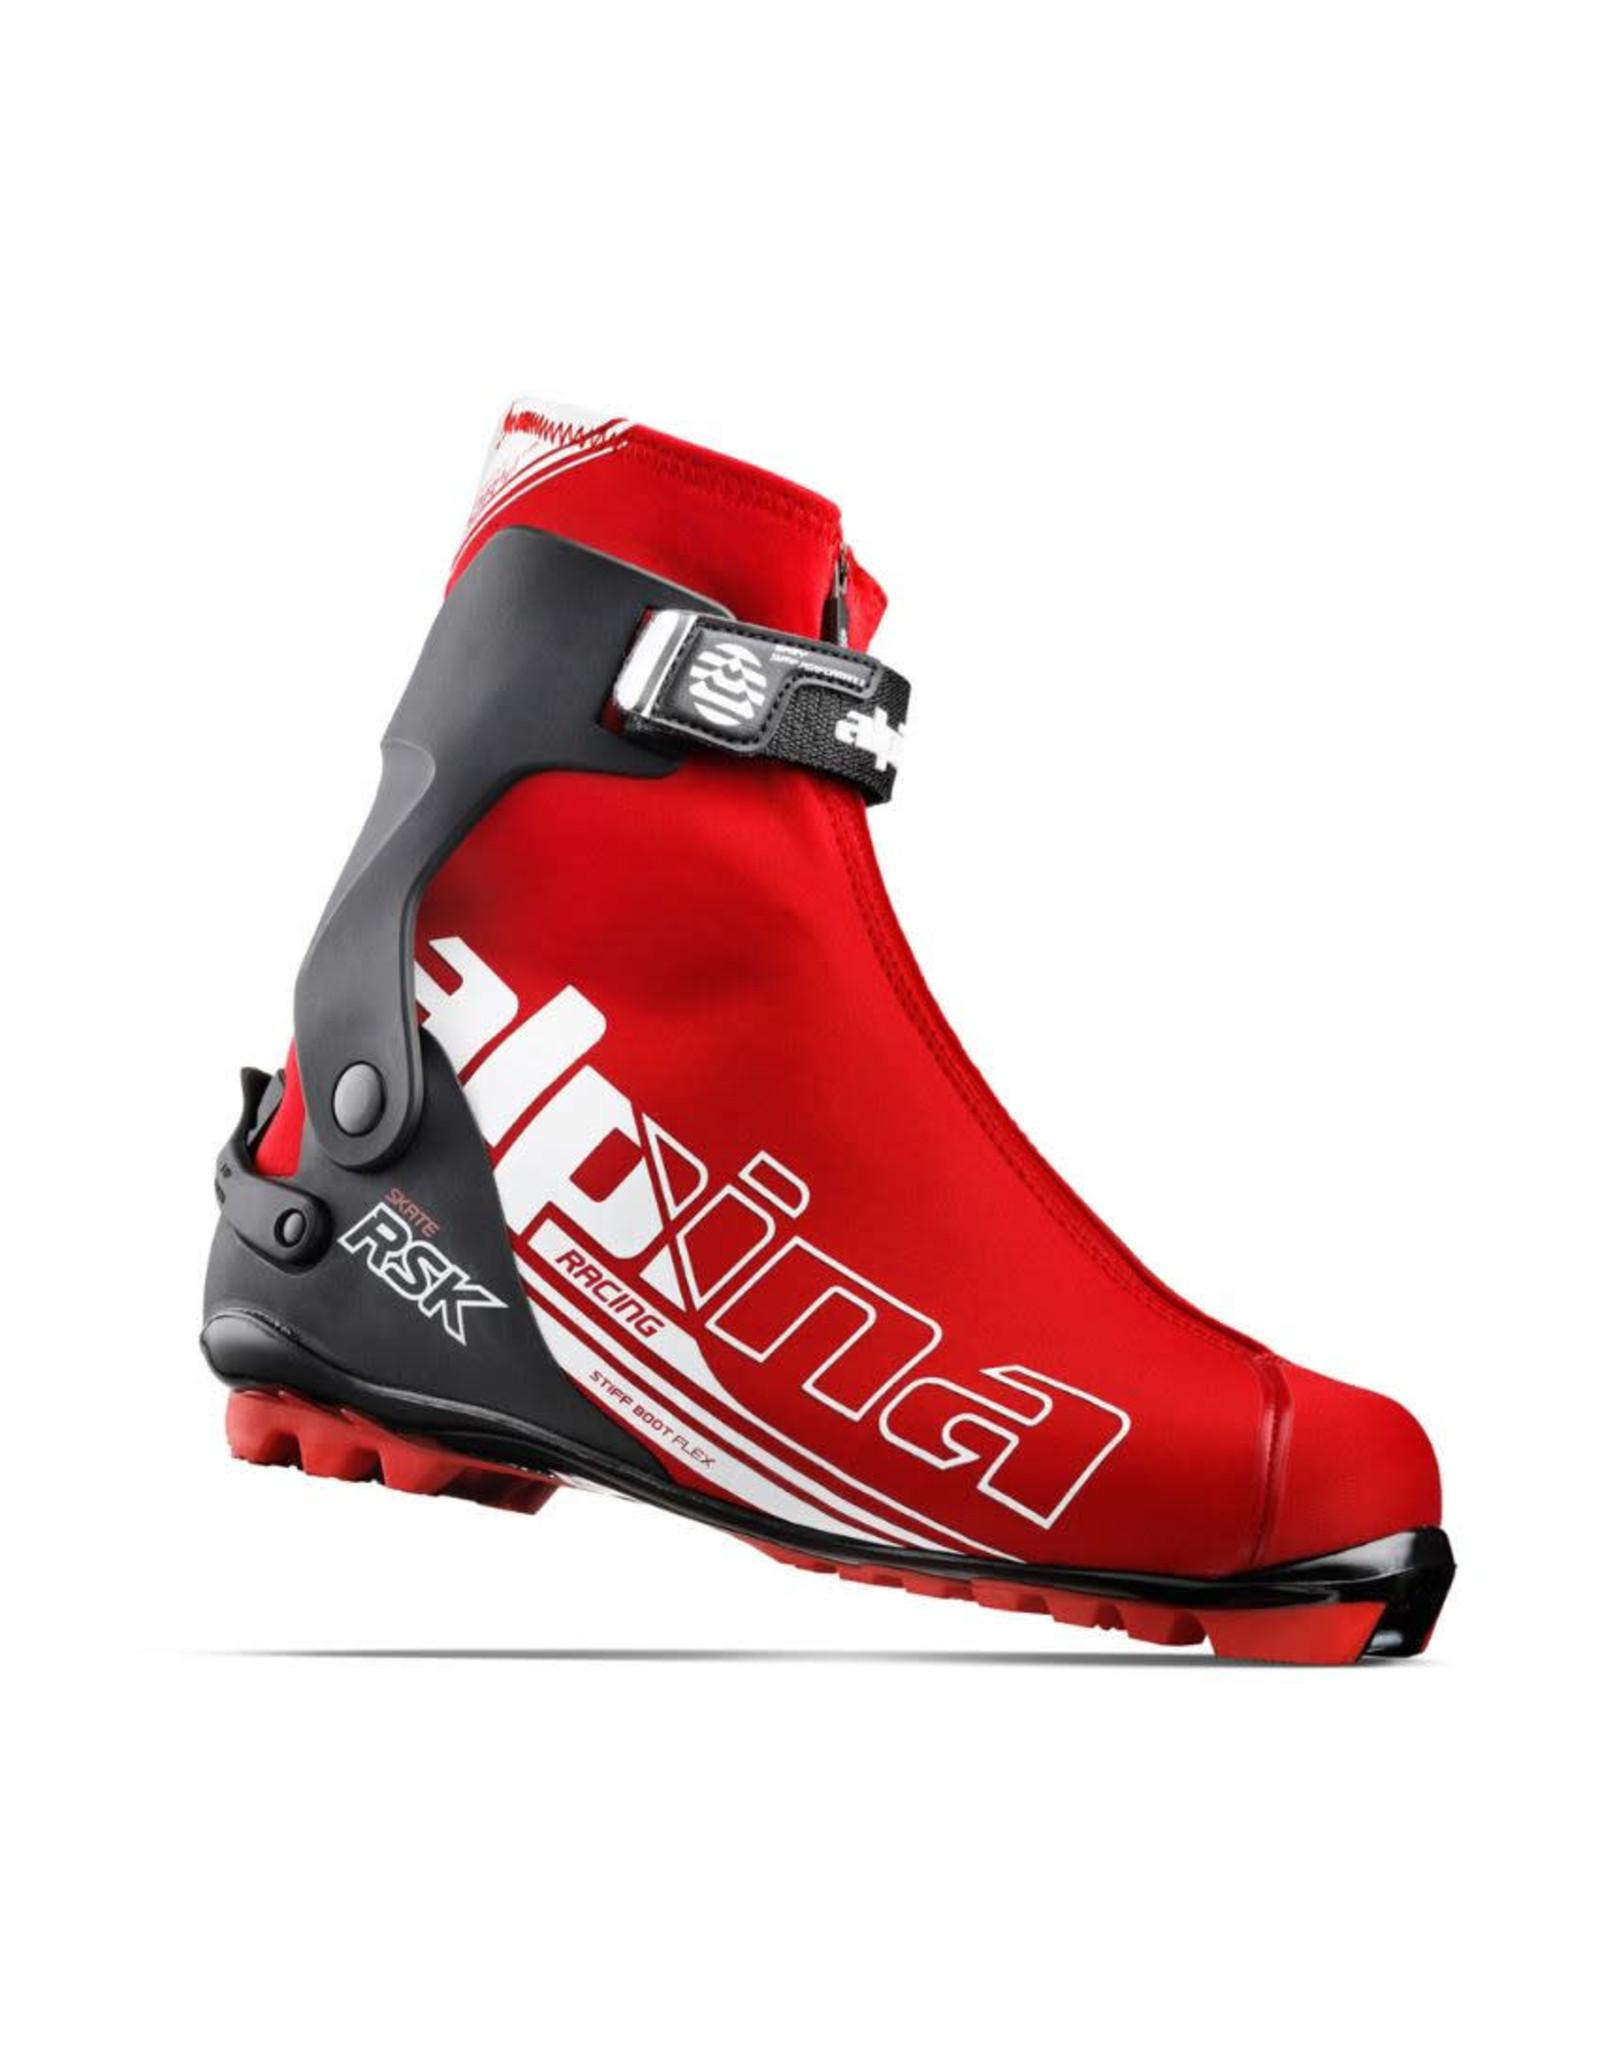 Alpina Alpina RSK Skate Boot